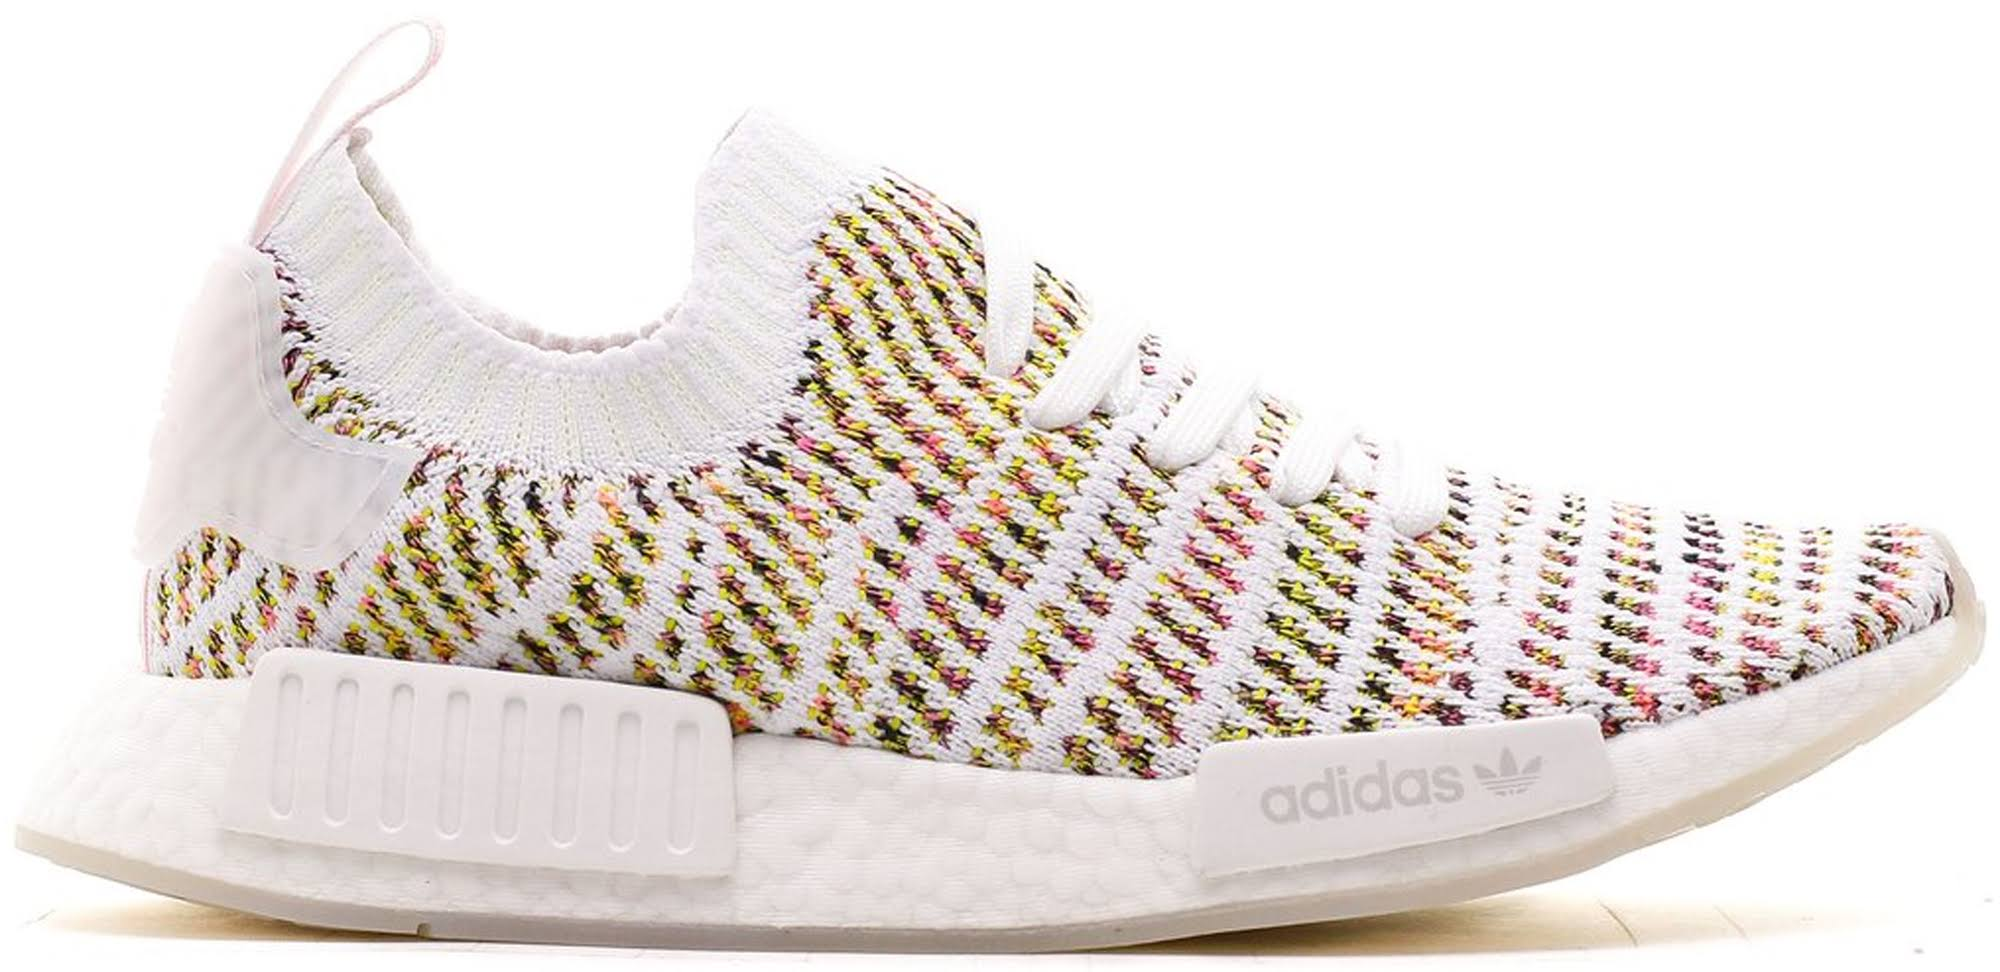 Adidas NMD R1 STLT Multi-Color (w)